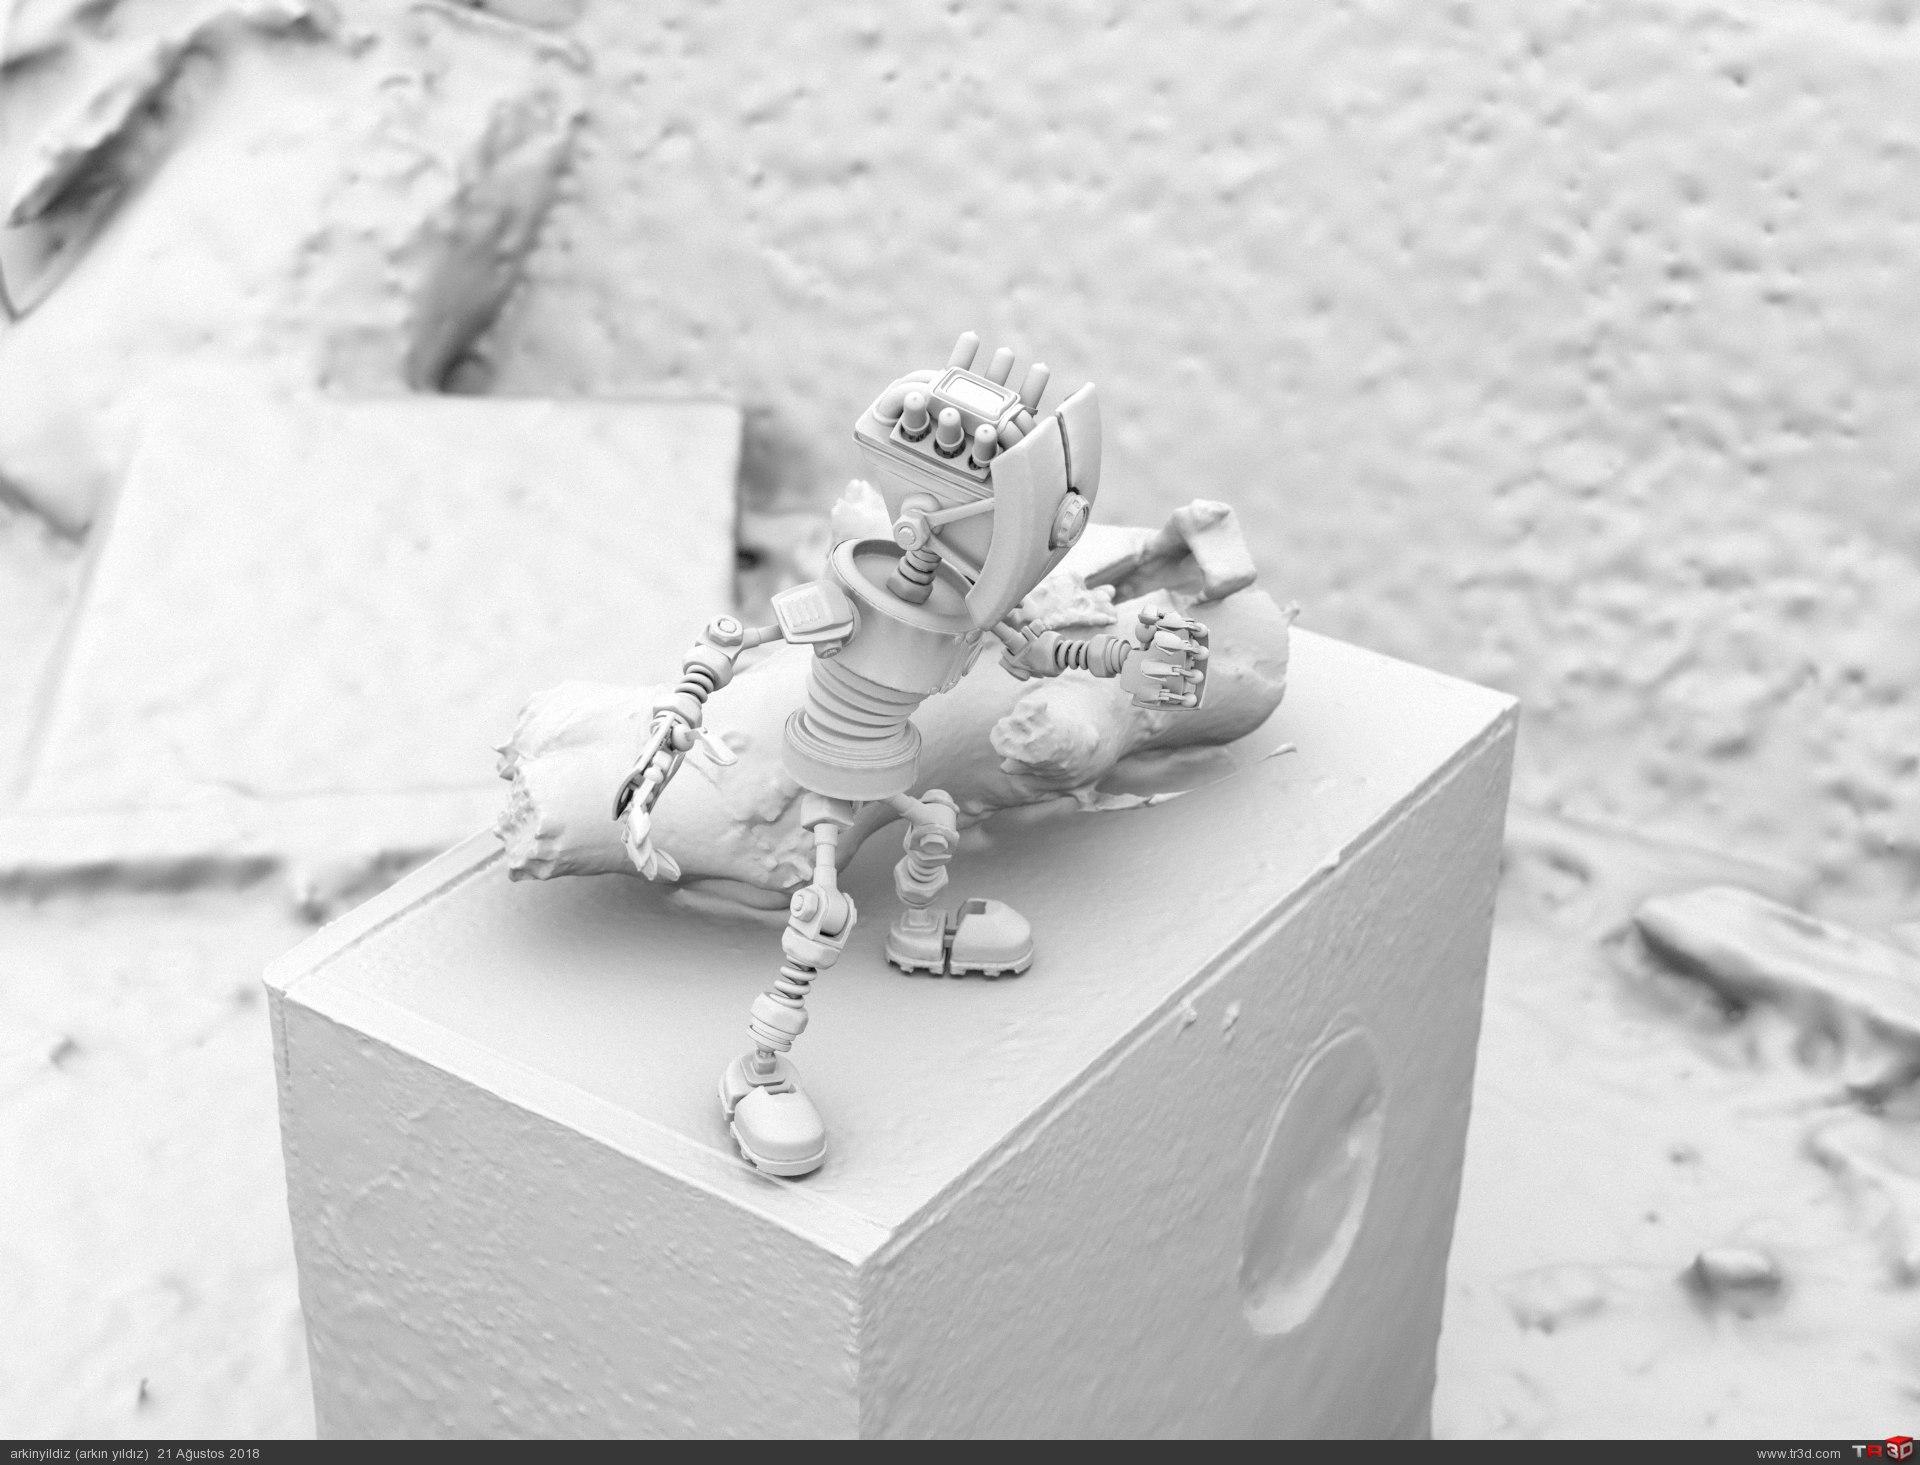 3D Scan Environment & 3D Robot Animation Test 3